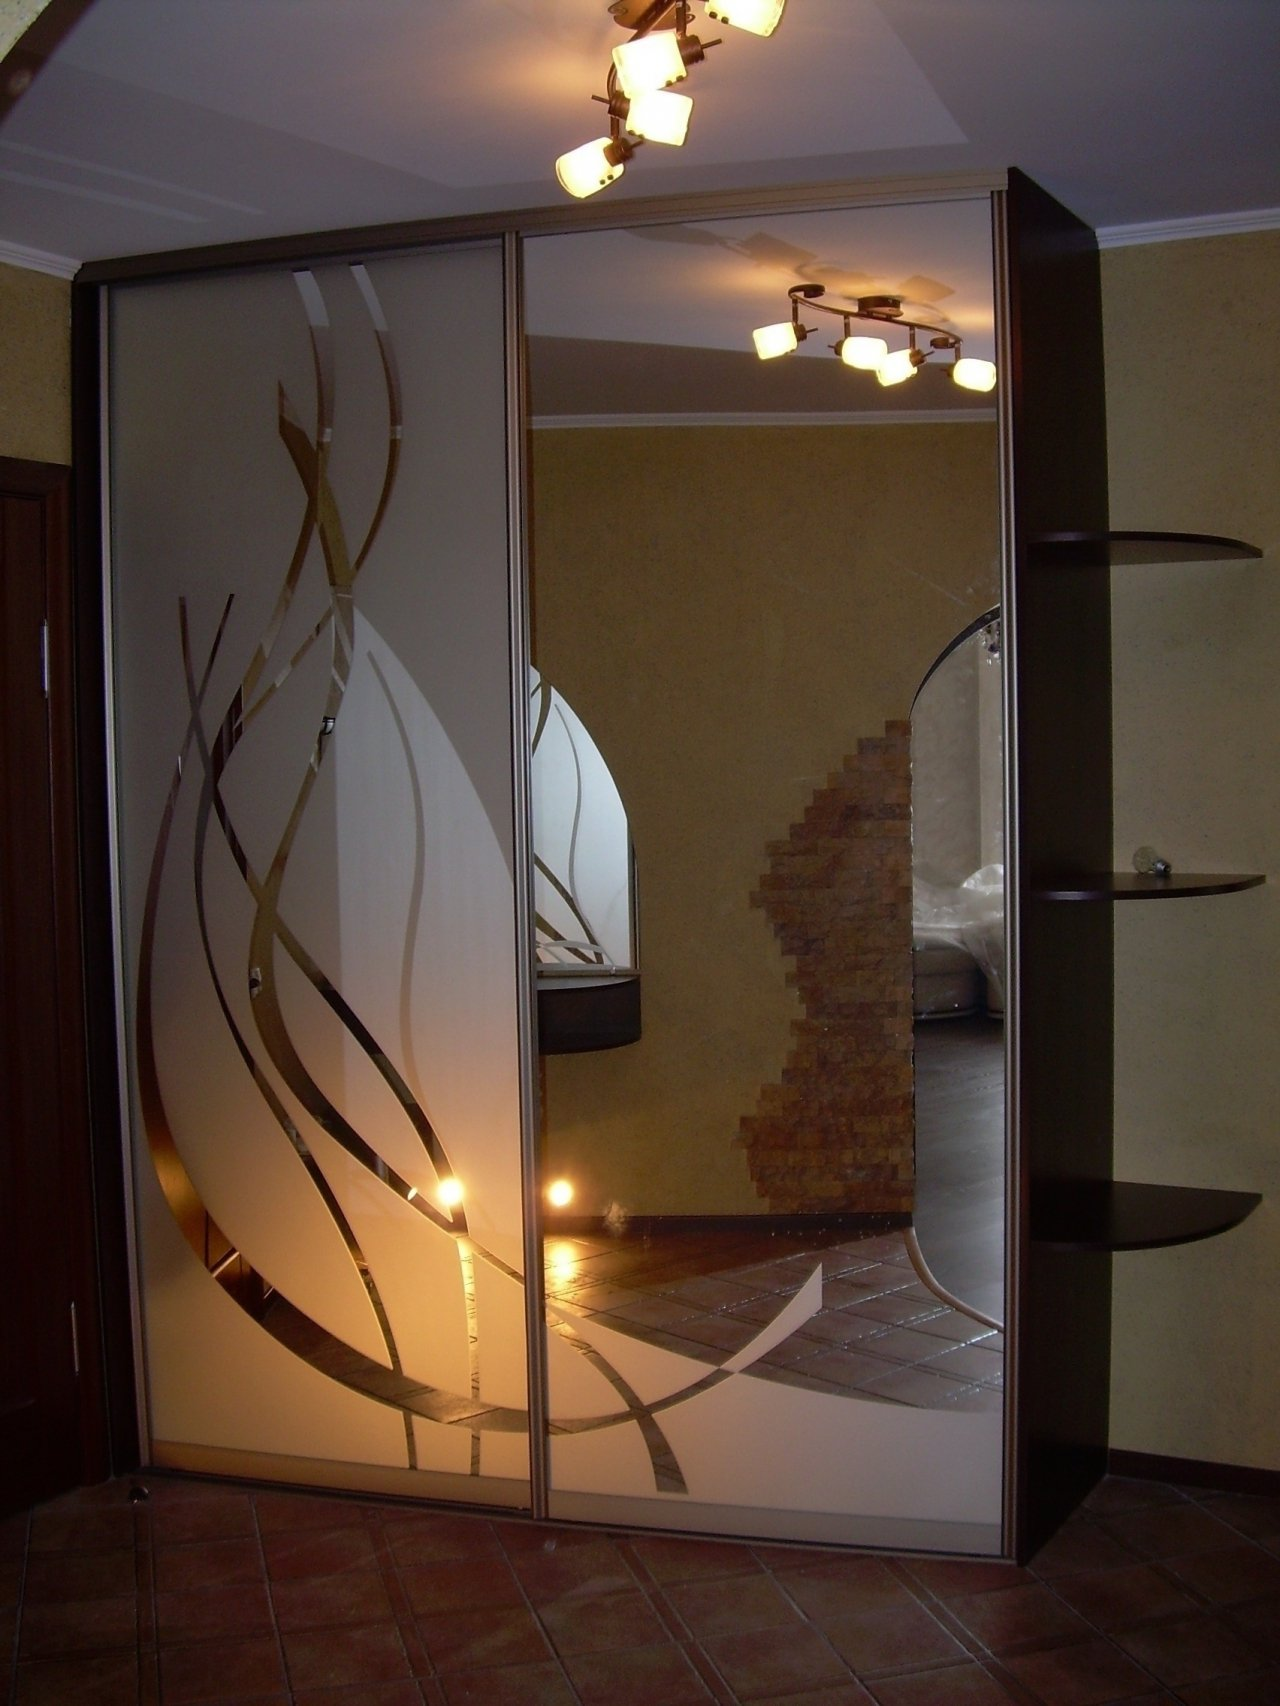 Узор пескоструй на зеркалах фото